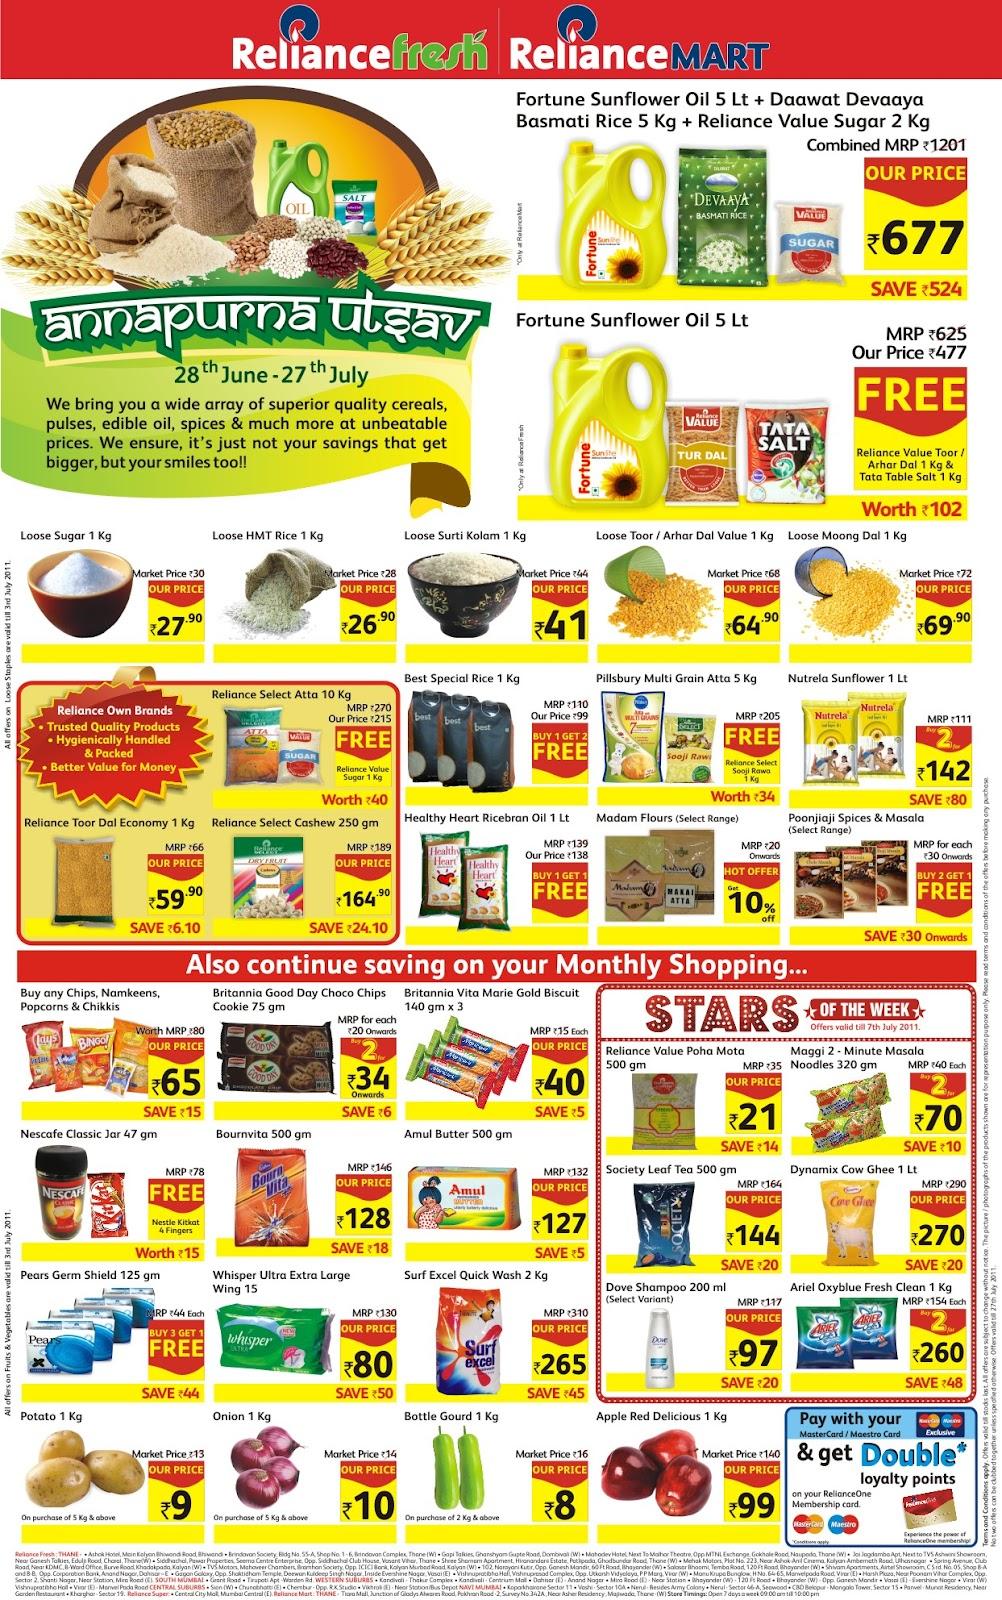 Copywriter: Reliance Fresh, Reliance Mart, Reliance Super